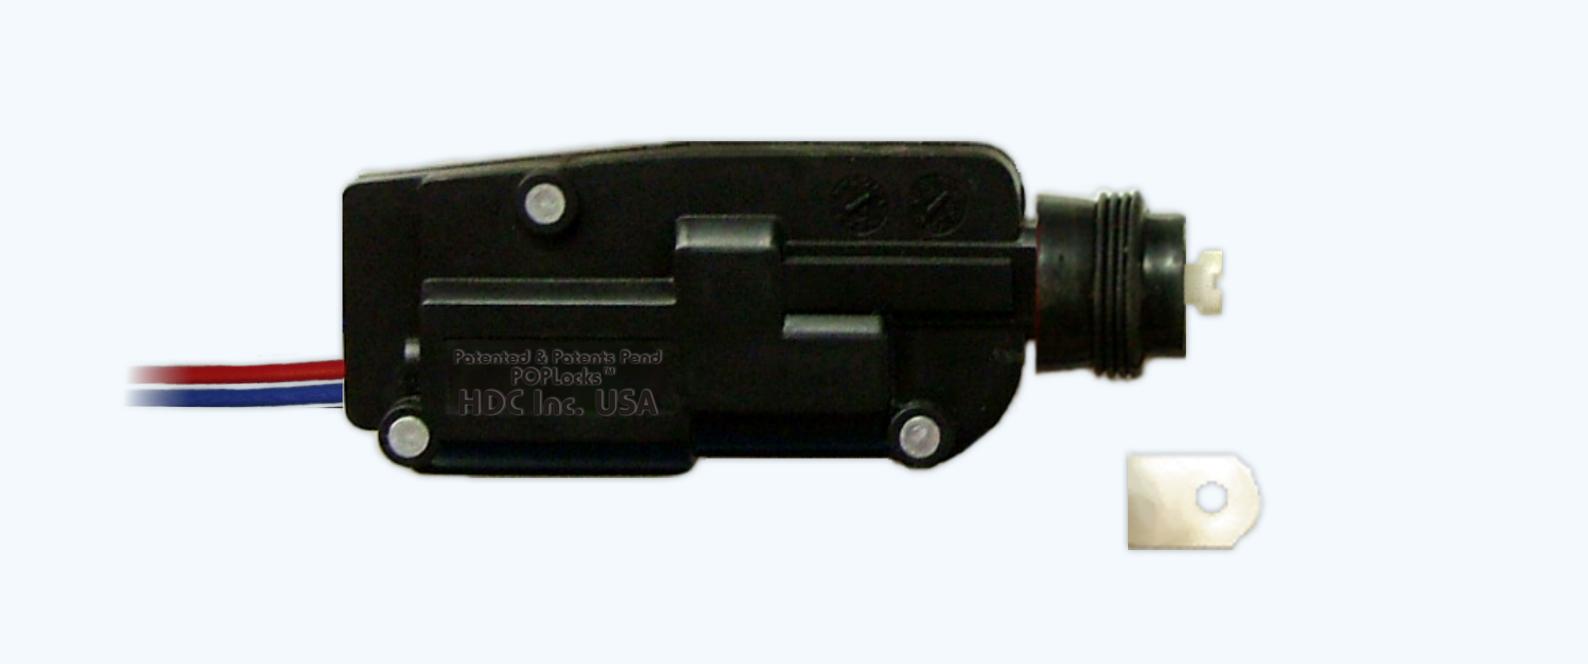 BA - Black Actuator Image